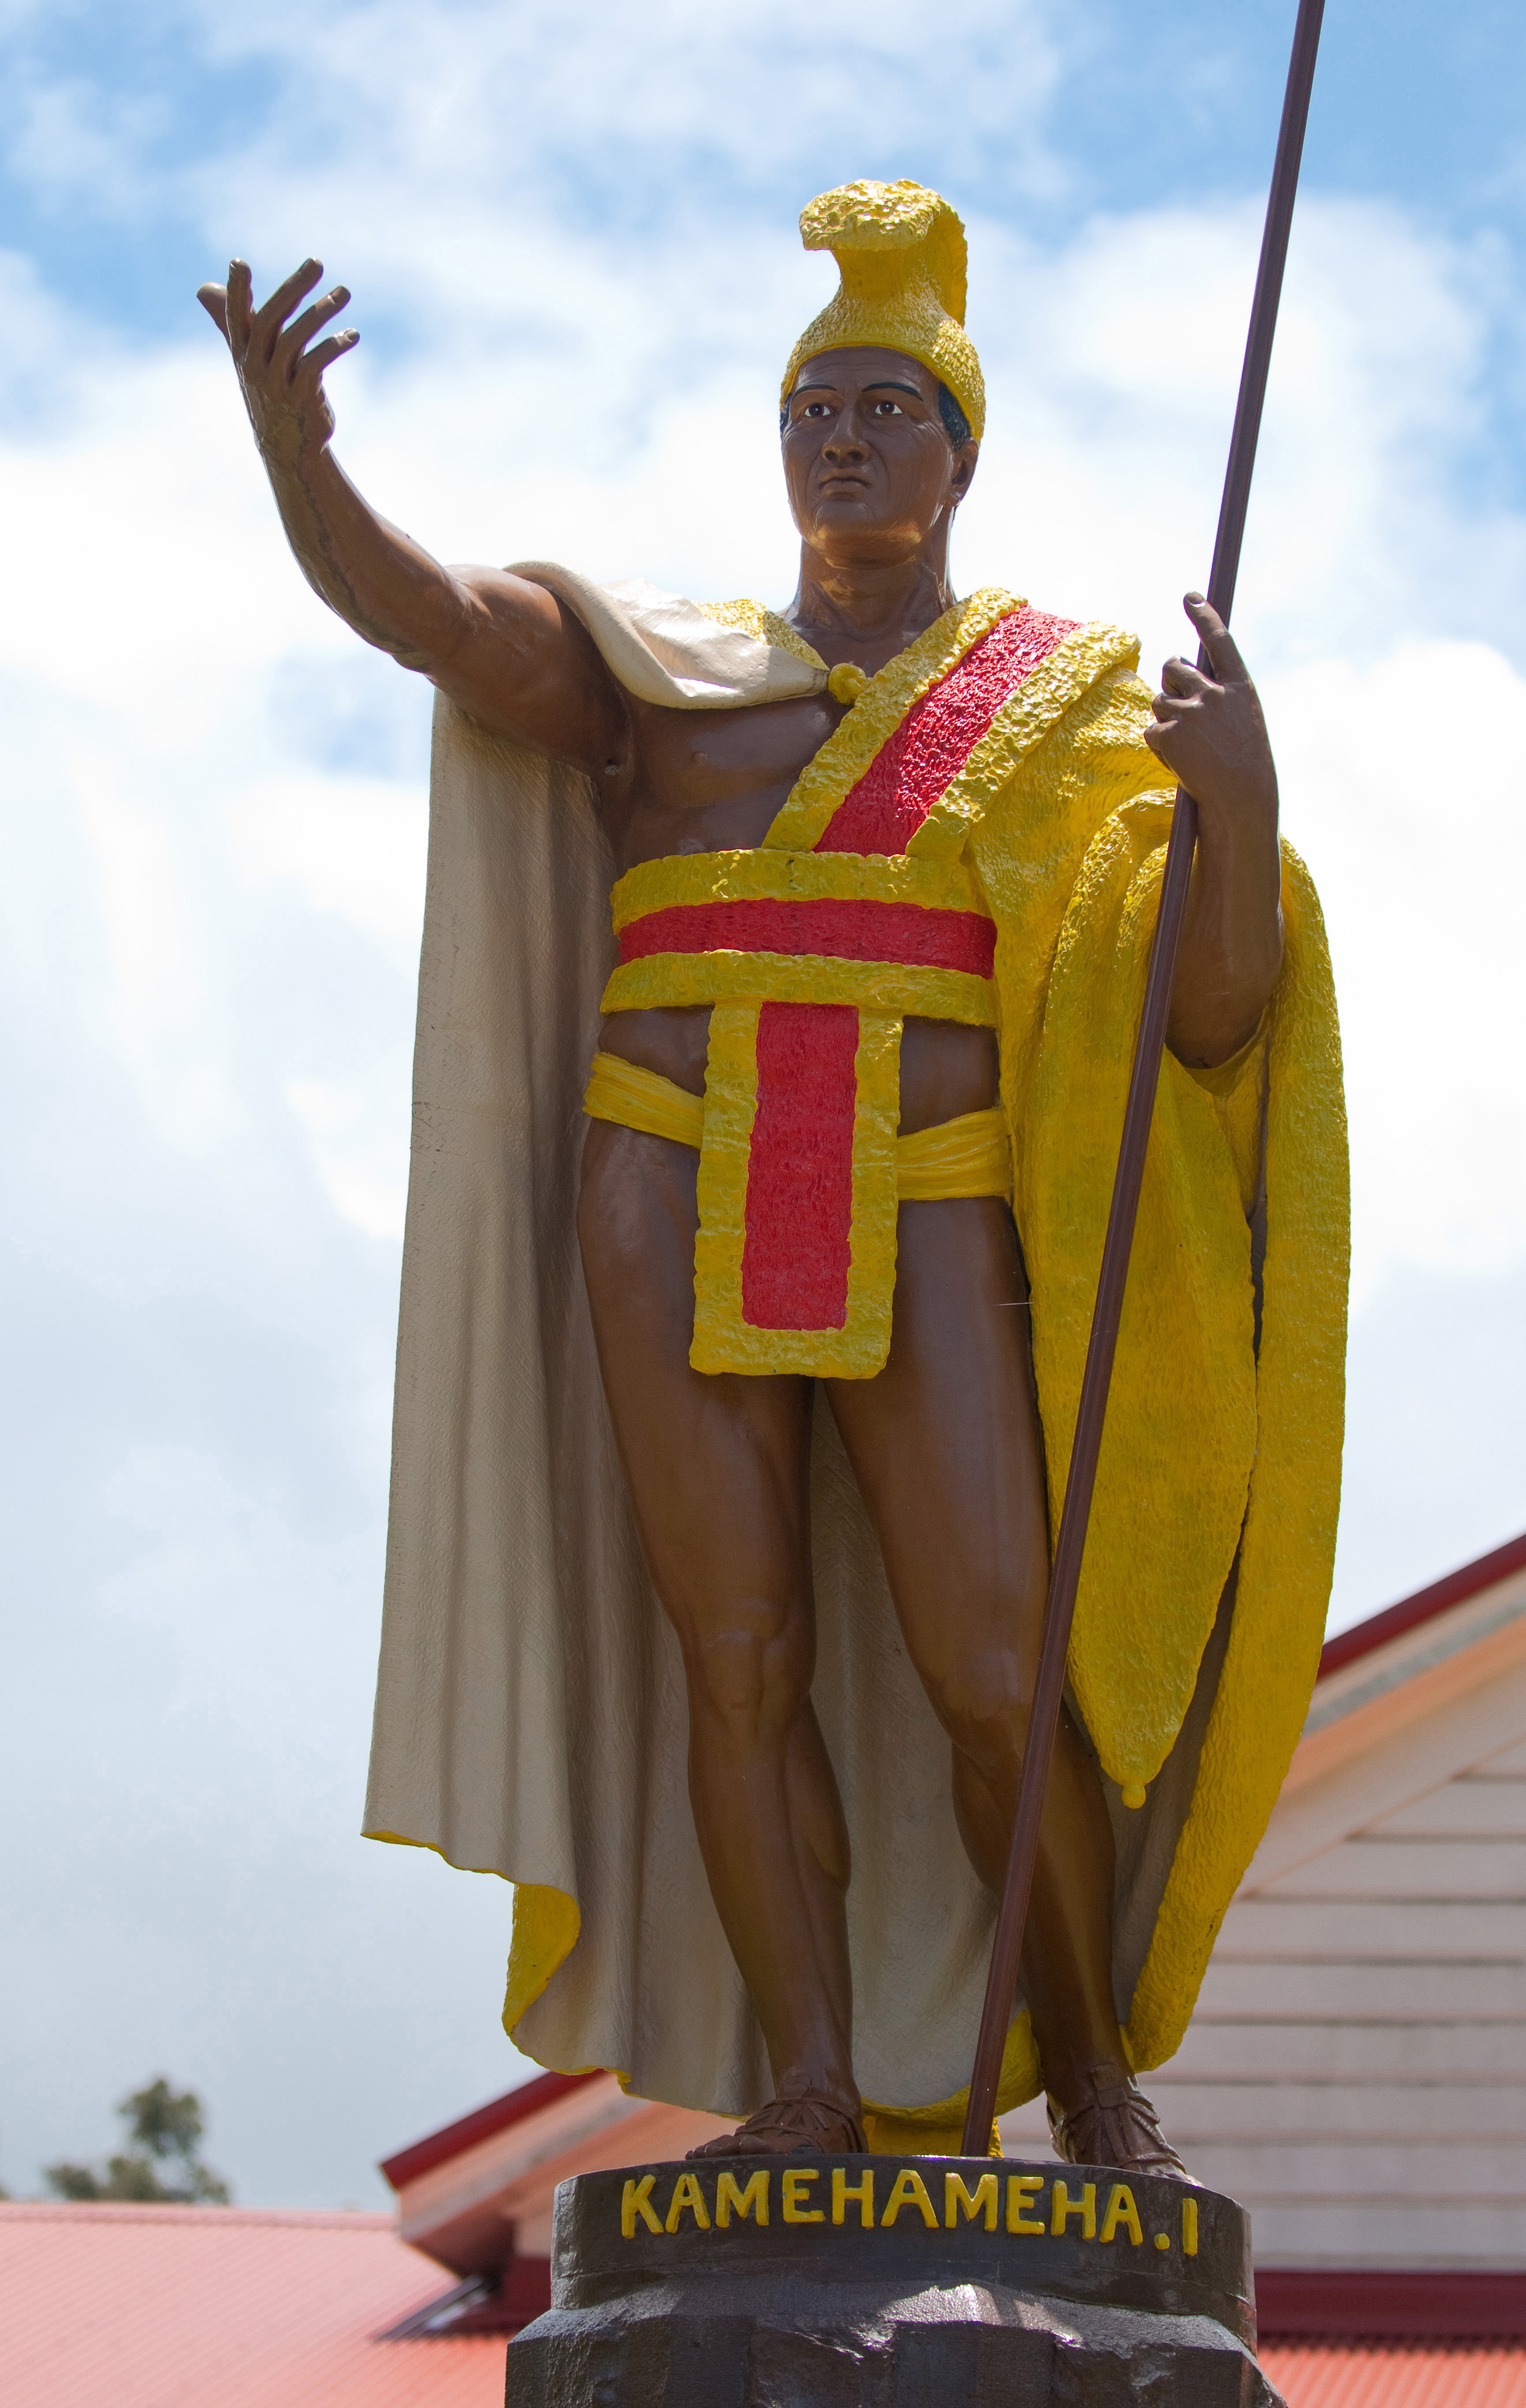 [Kamehameha] Kamehameha statue in Kohala. Photo by Ruben Carillo.